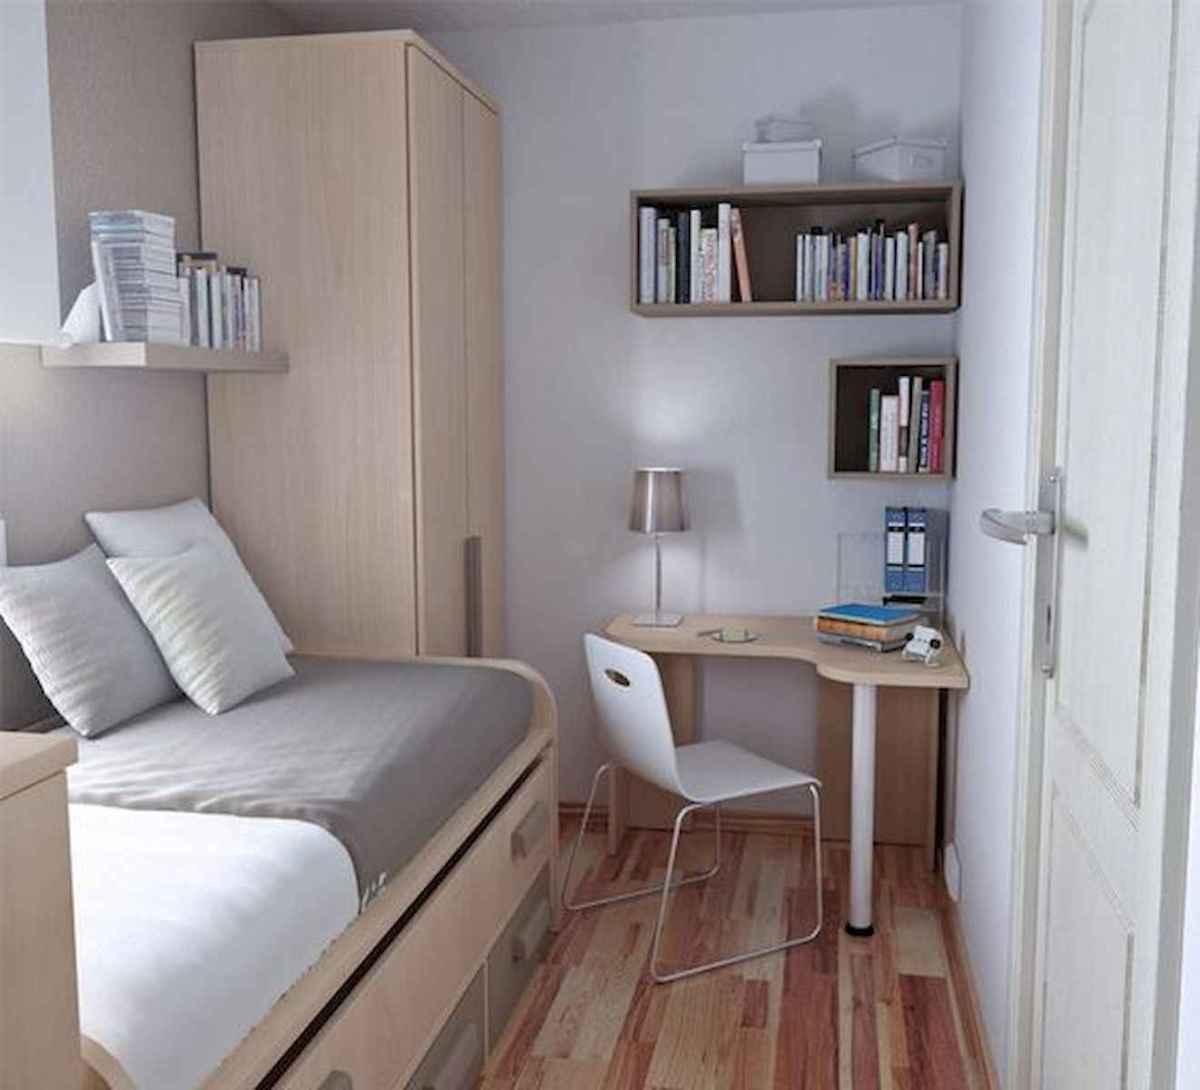 80 Fantastic Small Apartment Bedroom College Design Ideas and Decor (2)